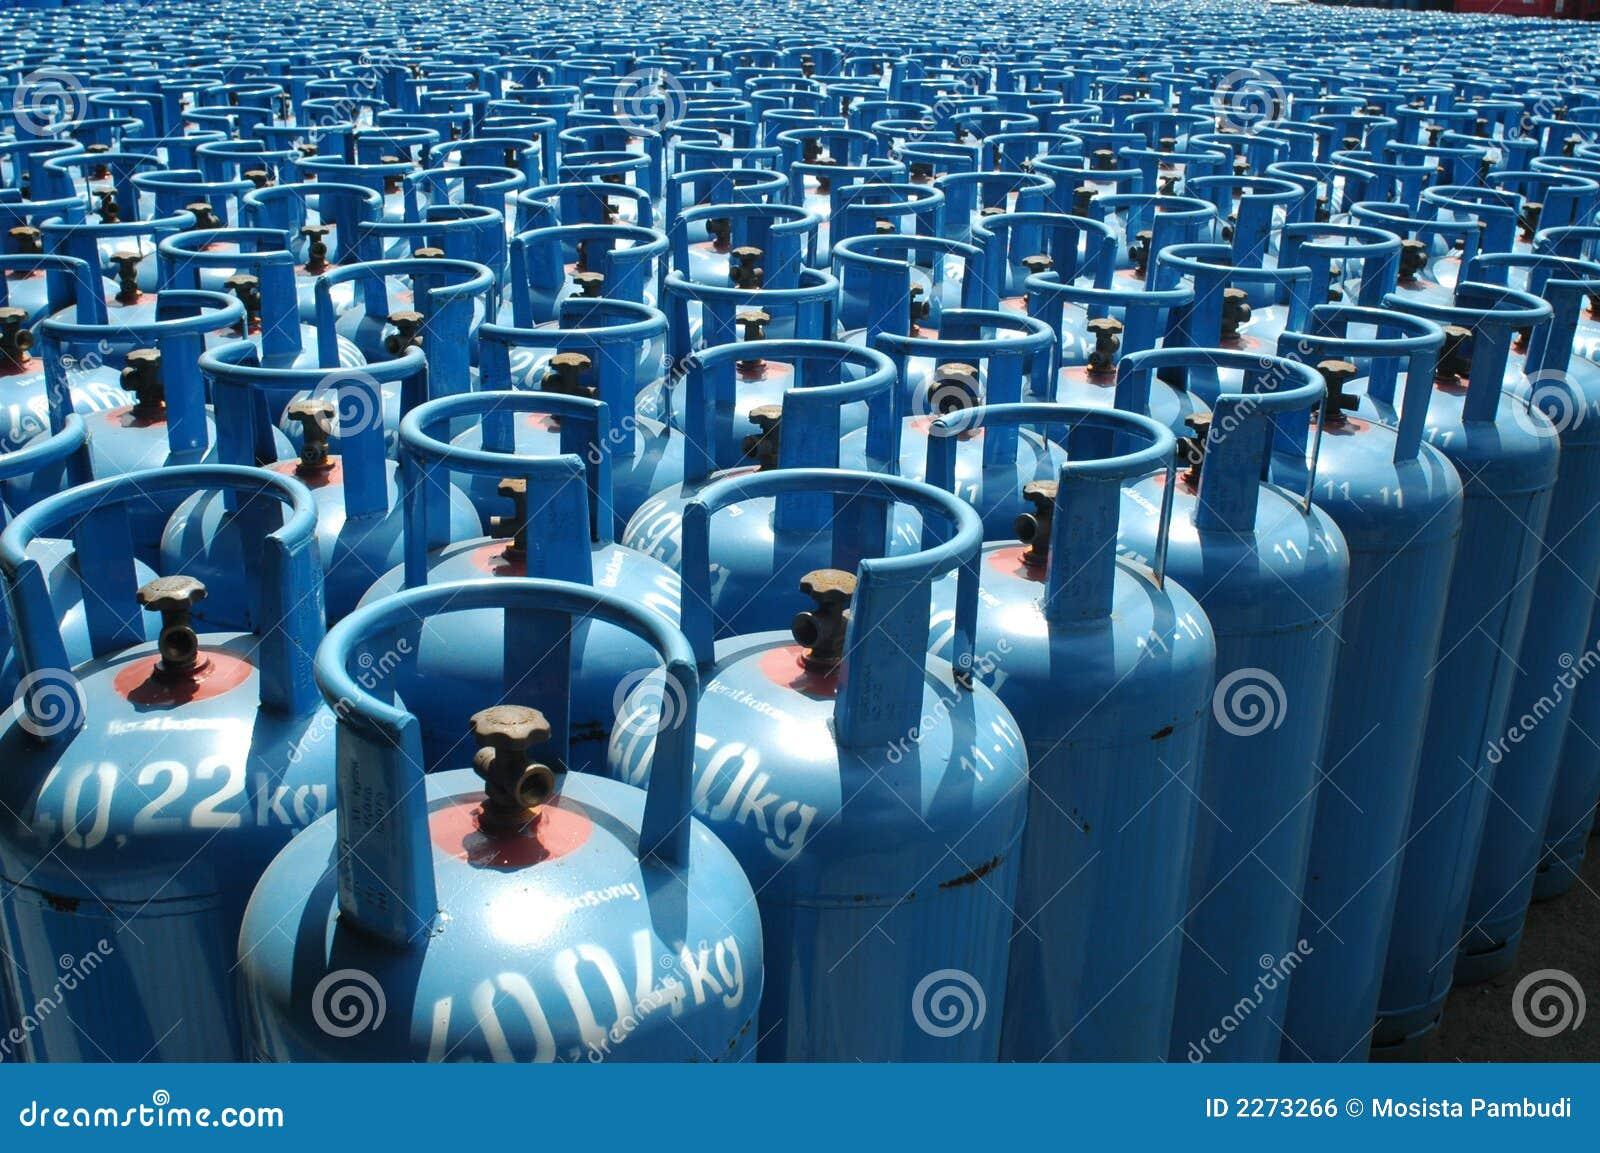 Gas Bottle Prices >> Liquid Petroleum Gas stock photo. Image of stocks, power - 2273266